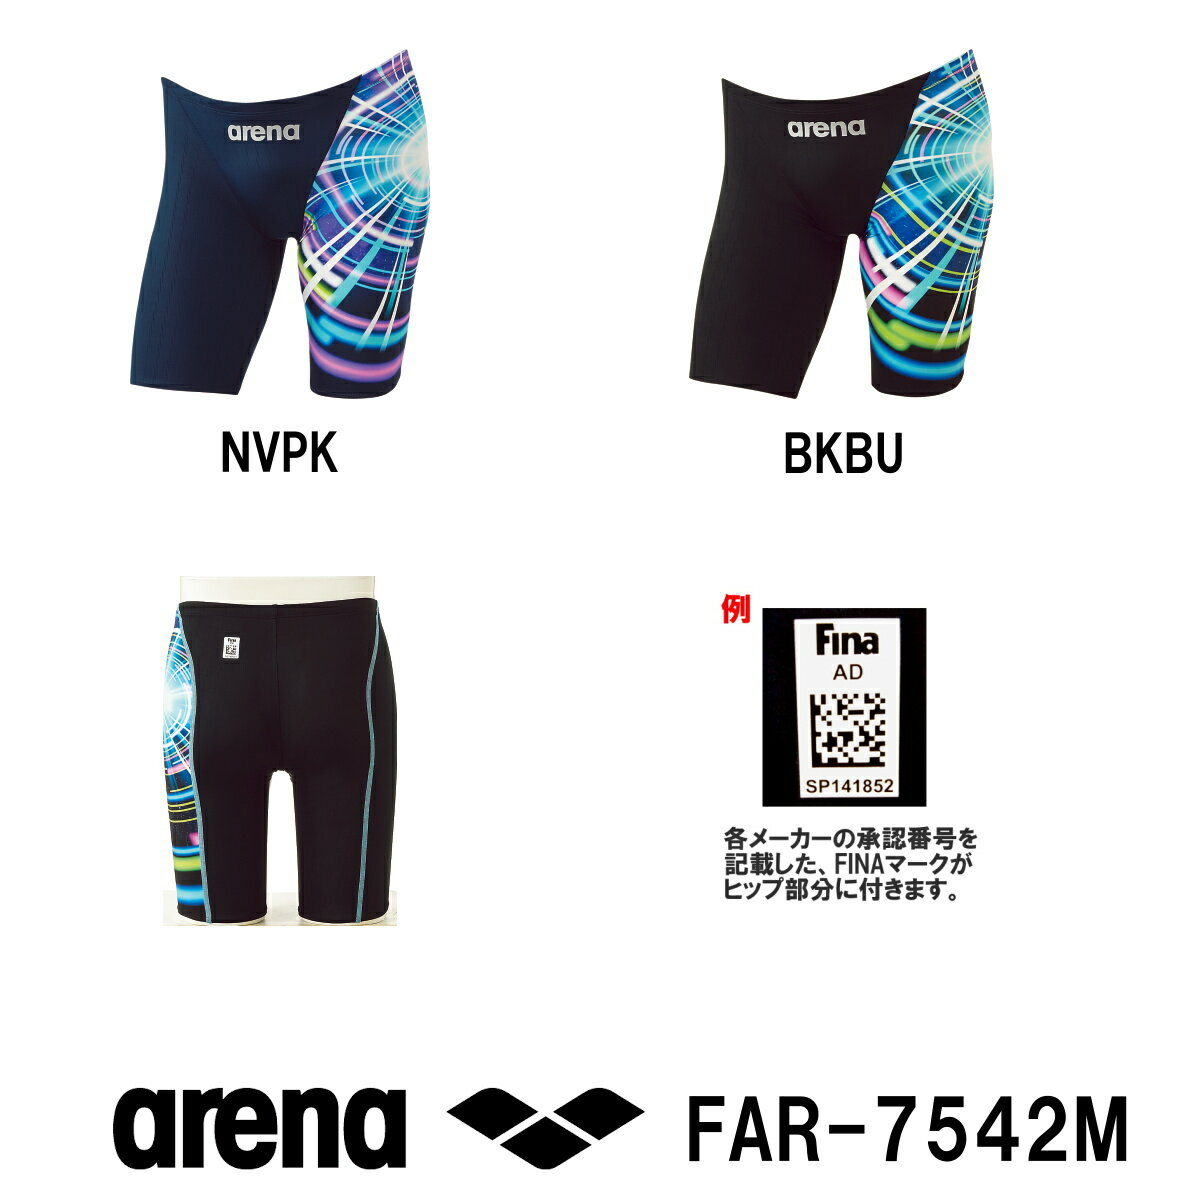 arena アリーナ 競泳水着 メンズ スイムウェア スイミング ハーフスパッツ fina承認 X-PYTHON2 2017年FWモデル FAR-7542M